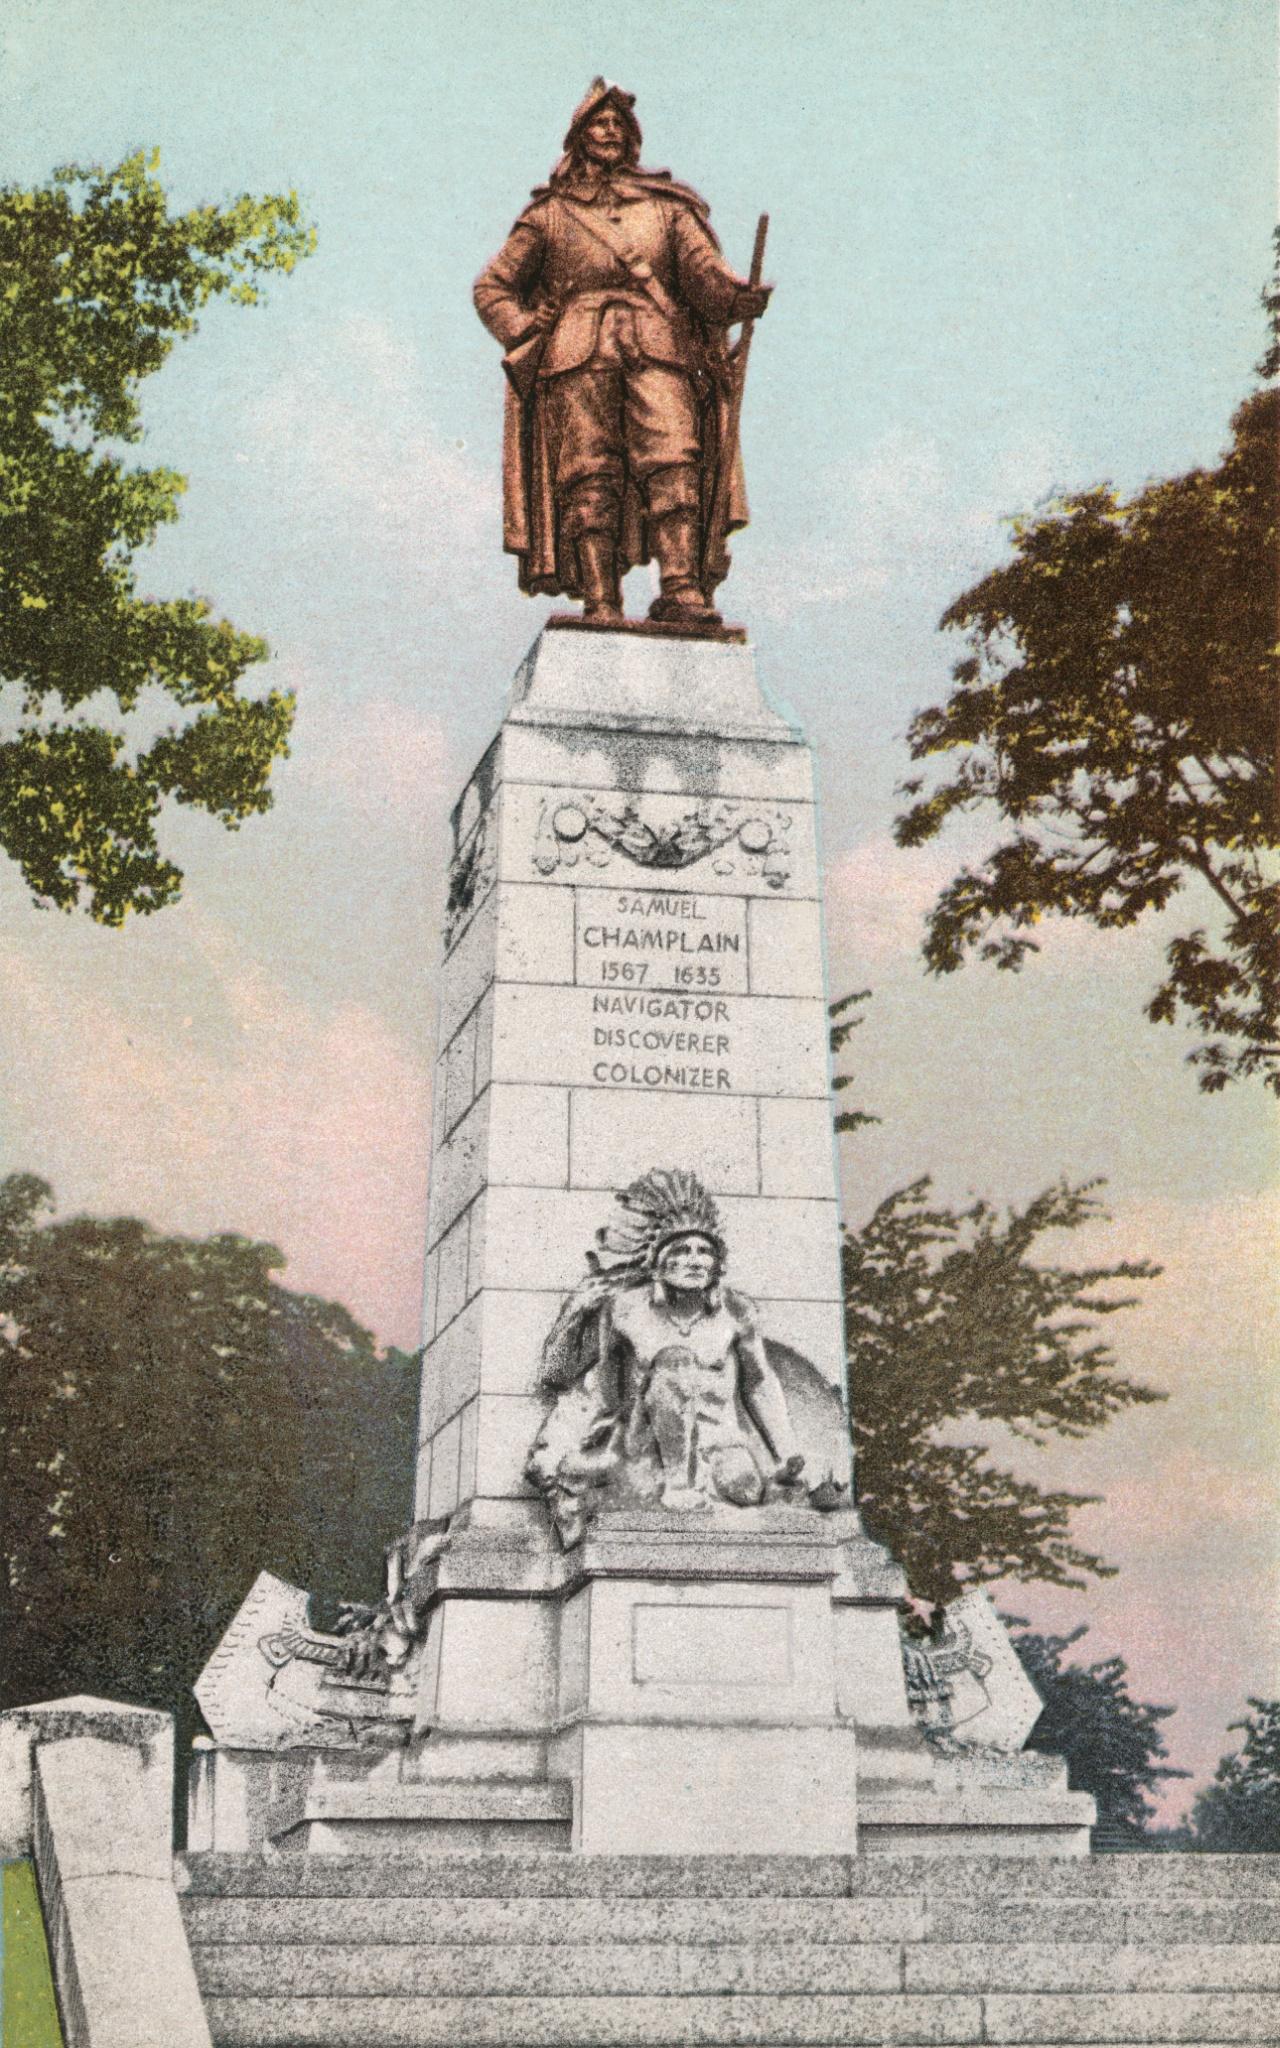 Monument to Samuel De Champlain, Plattsburgh, N. Y.